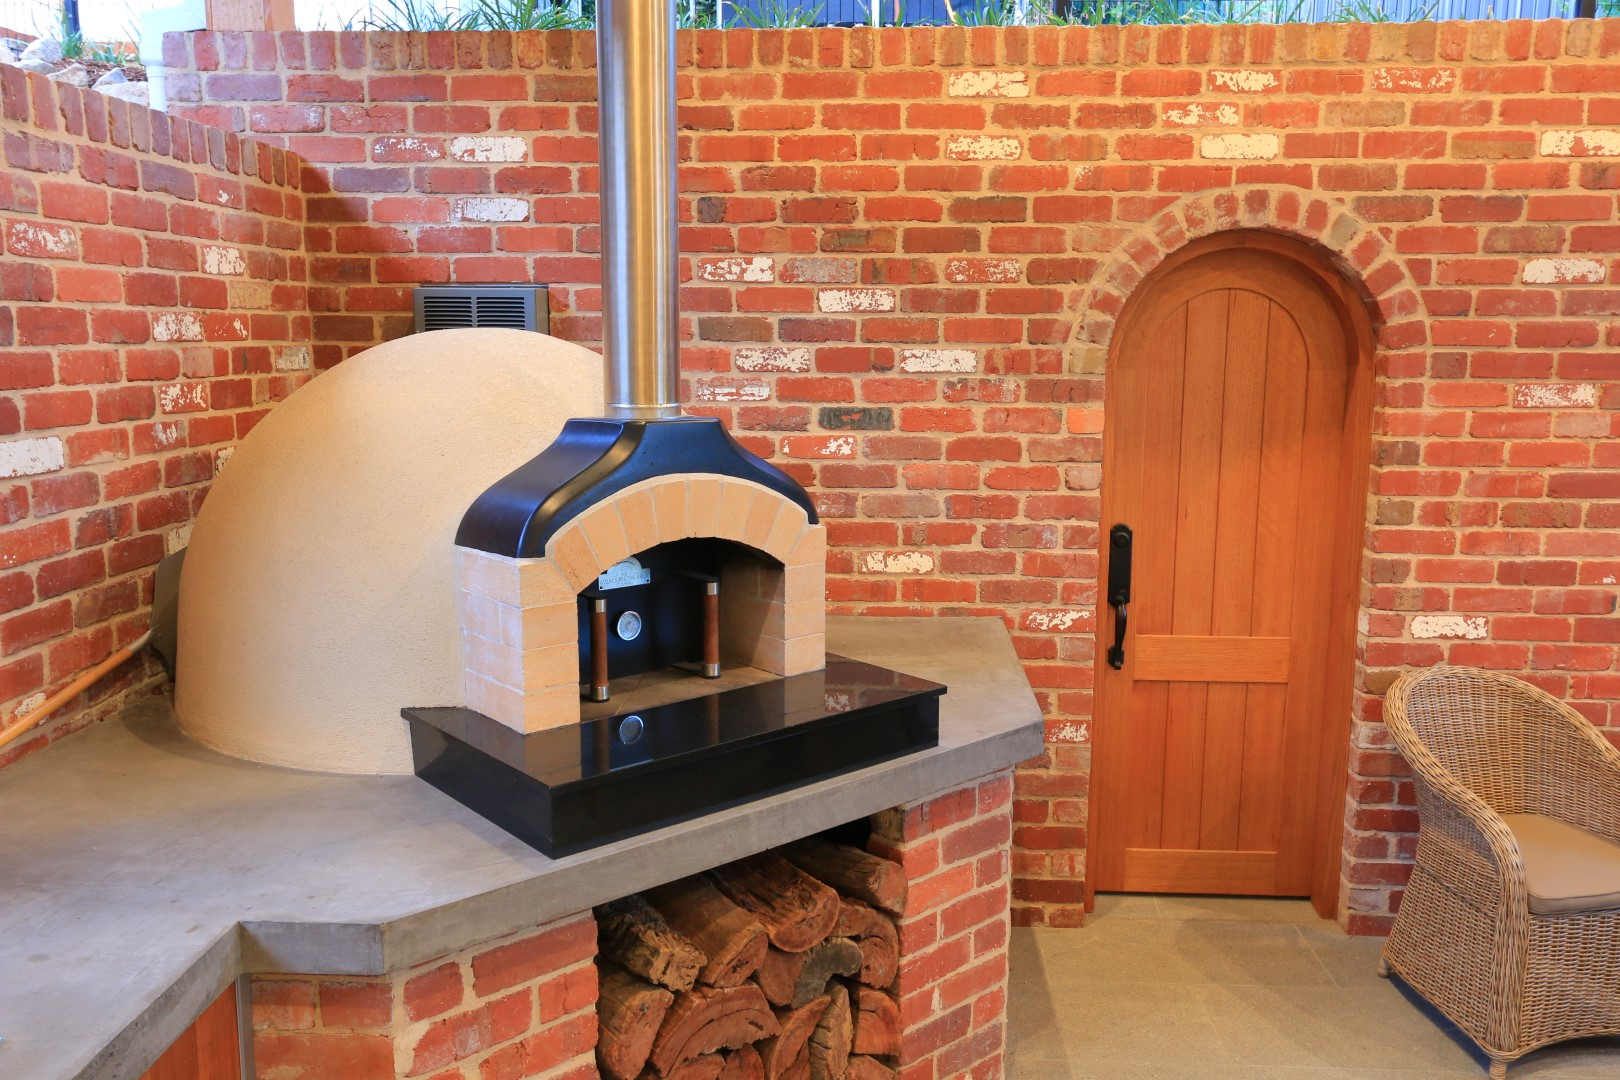 D95 Brick Oven - Brad - 10